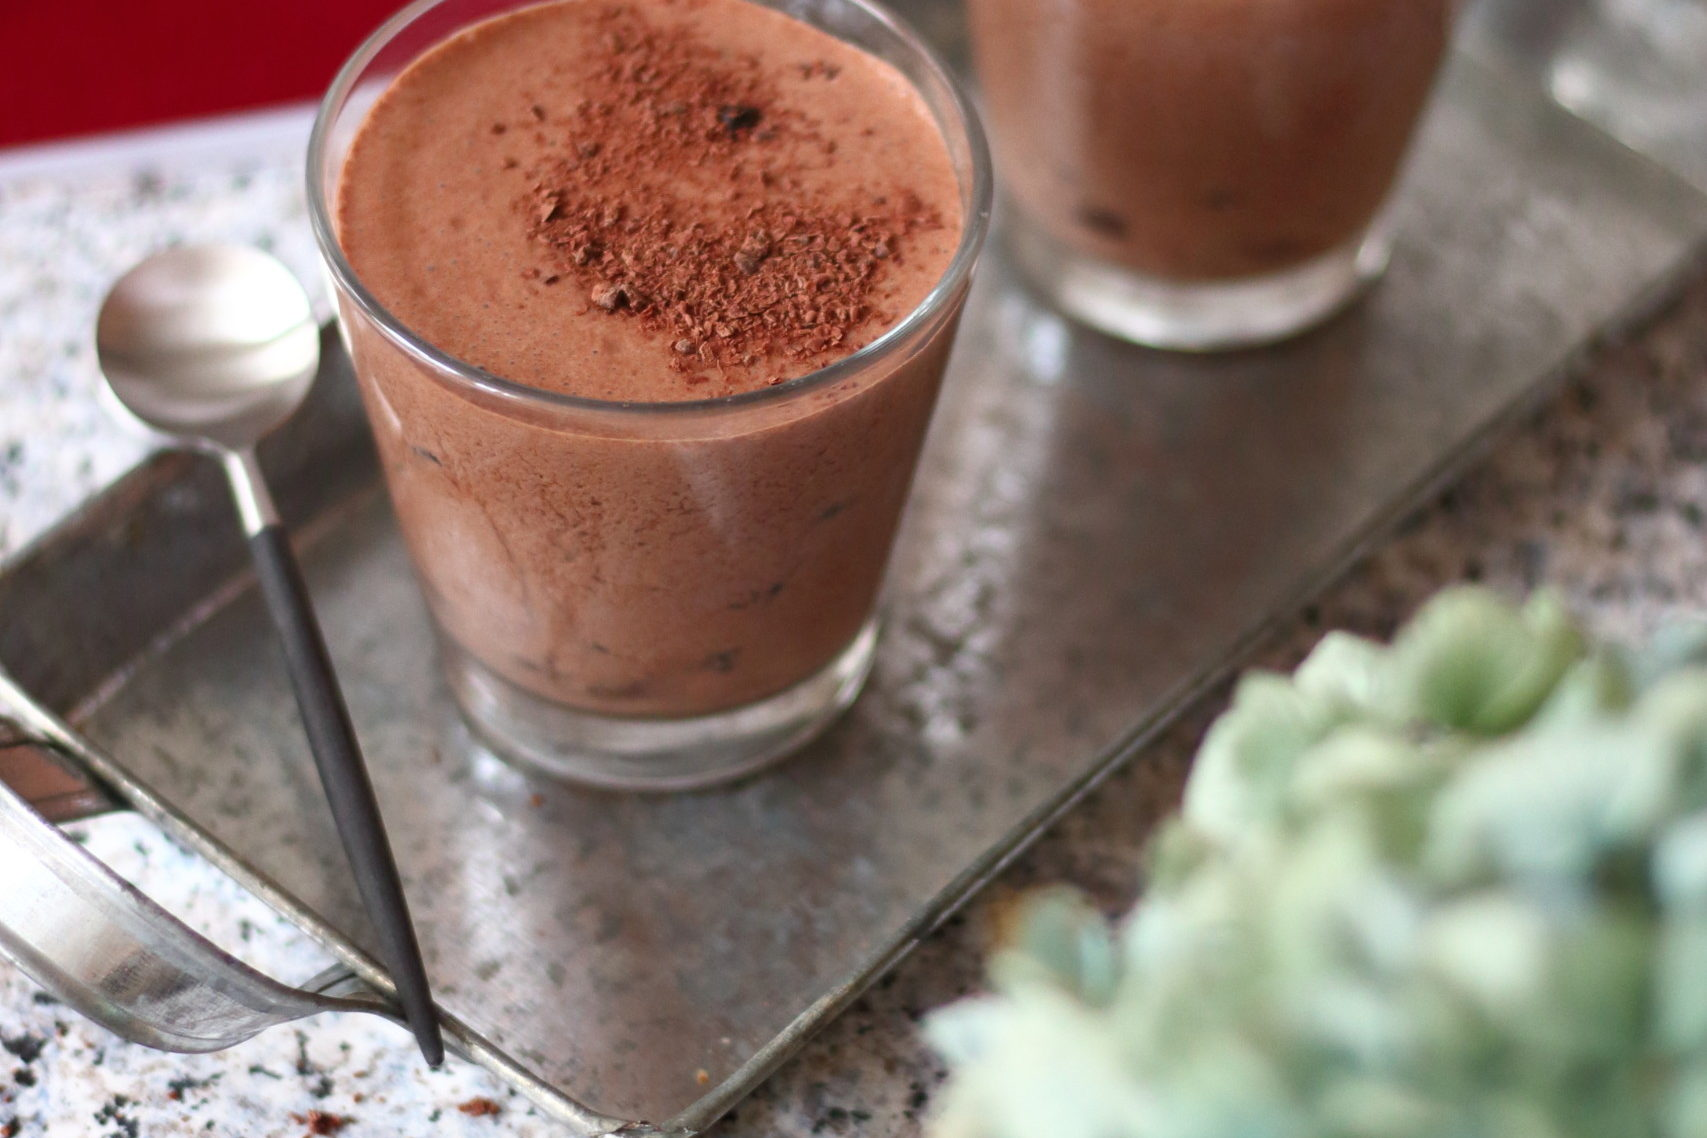 Iced Chocolate & almond milk drink